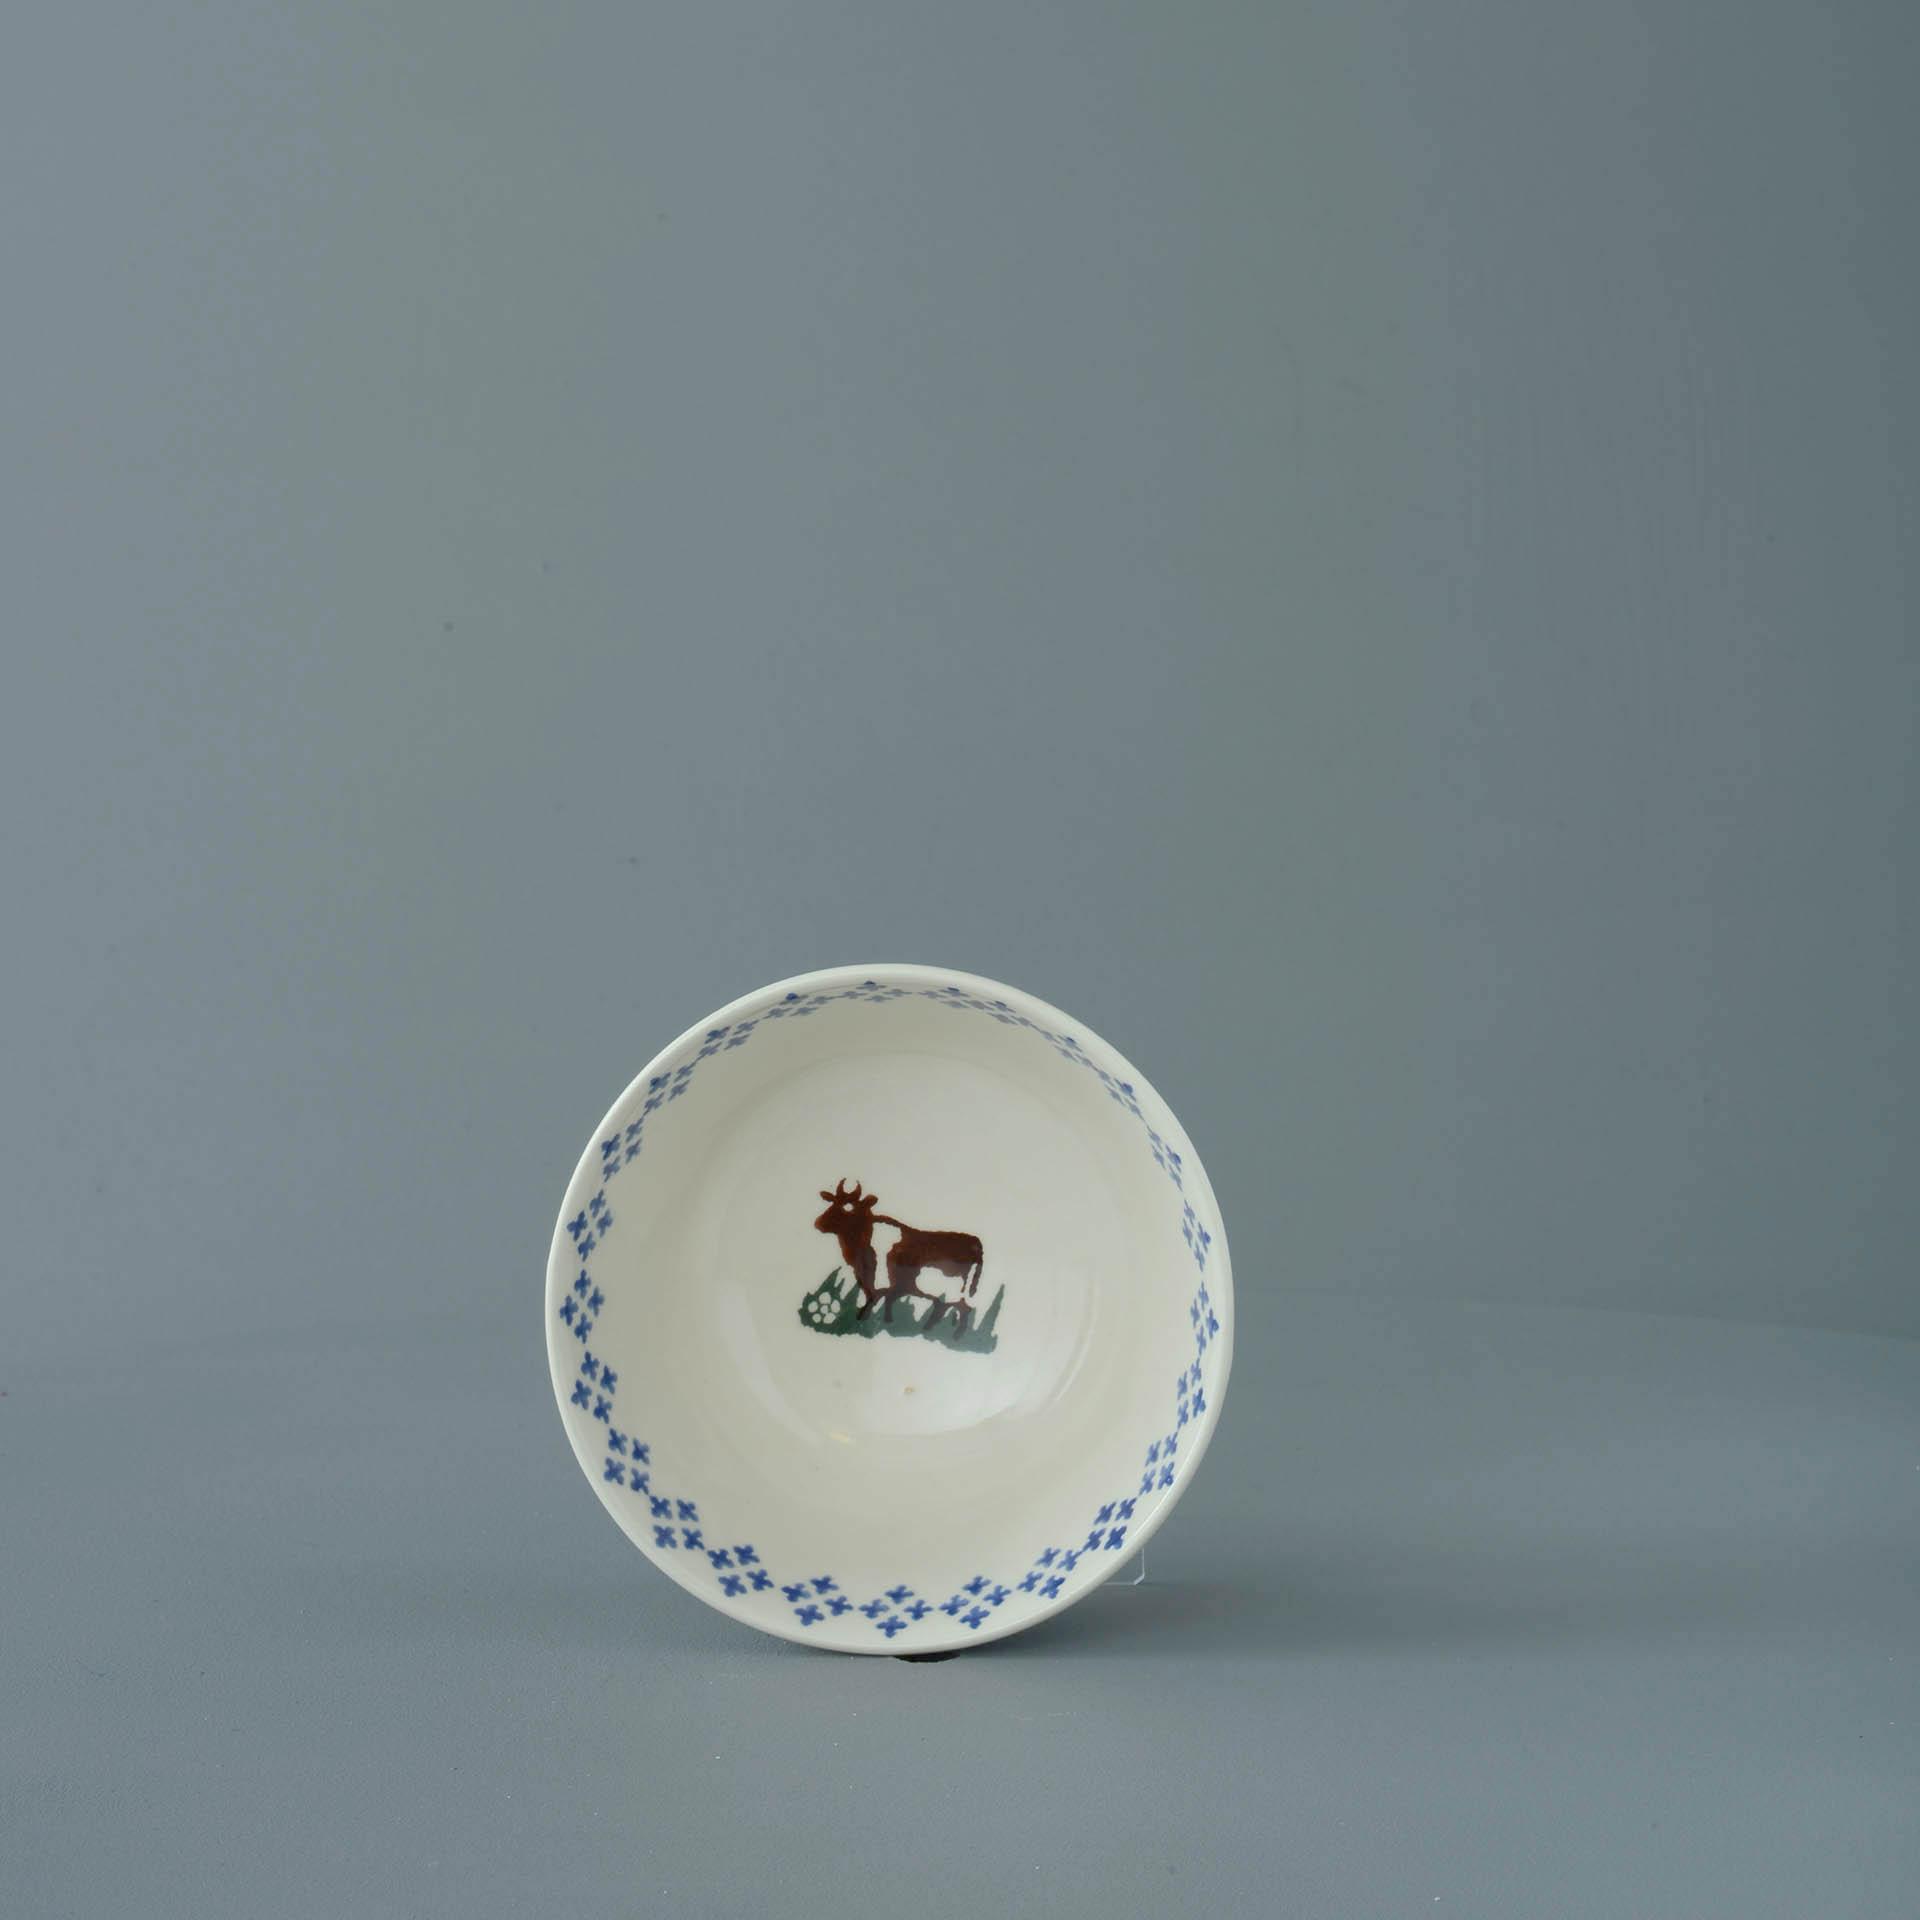 Cows Small Bowl 6.5 x 12 cm